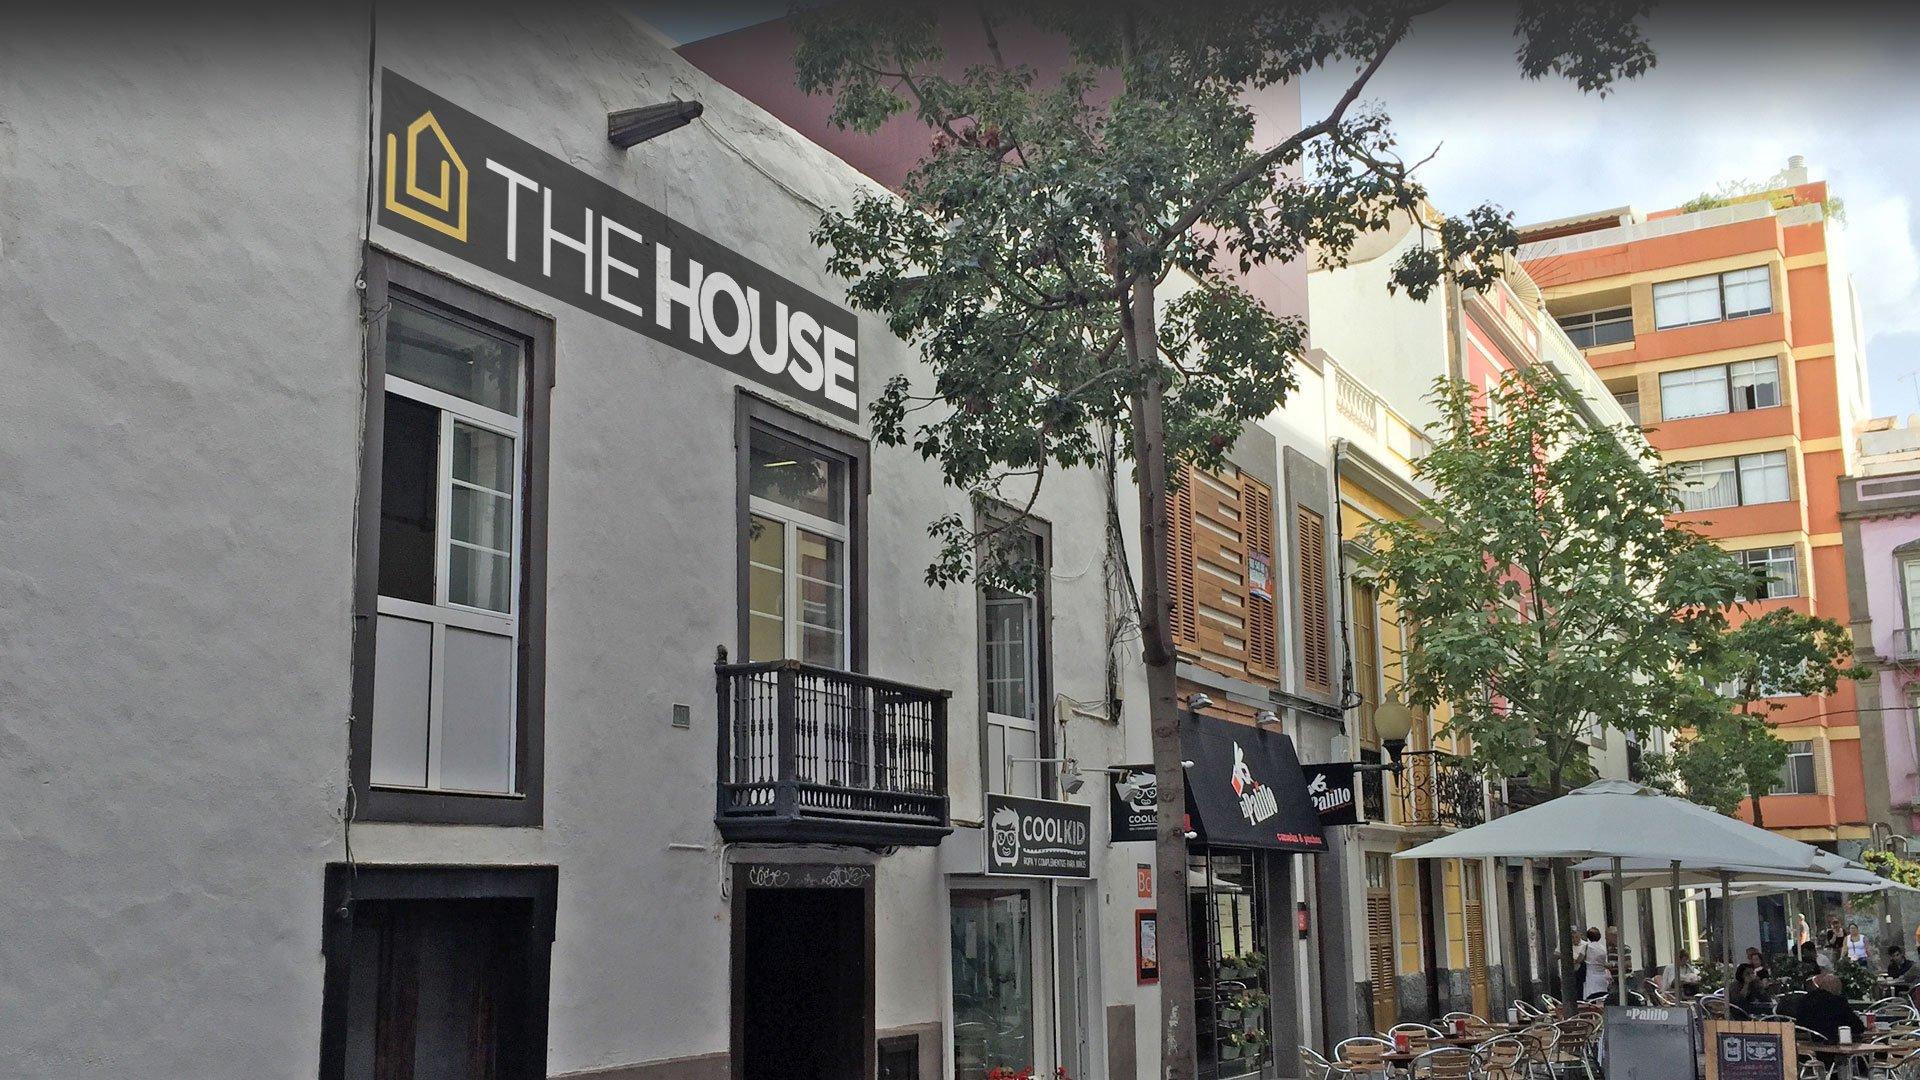 The-house-street